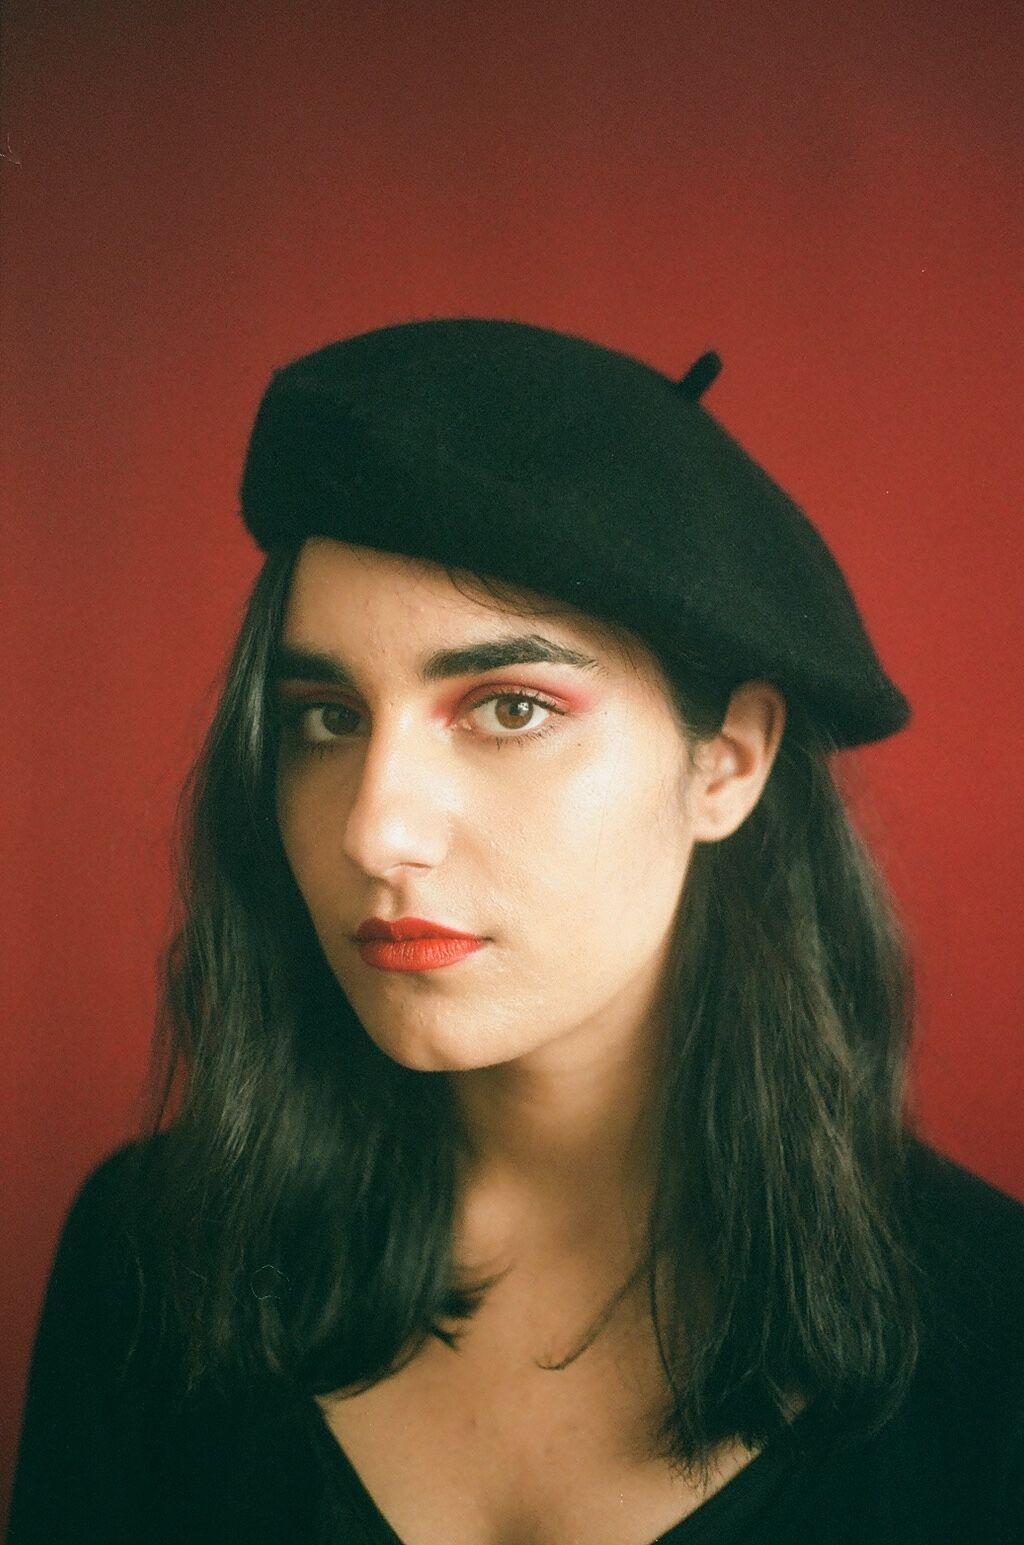 Hanna Sharif-Kazemi. Photo by Micah Pegues. Courtesy of Polychrome Mag.